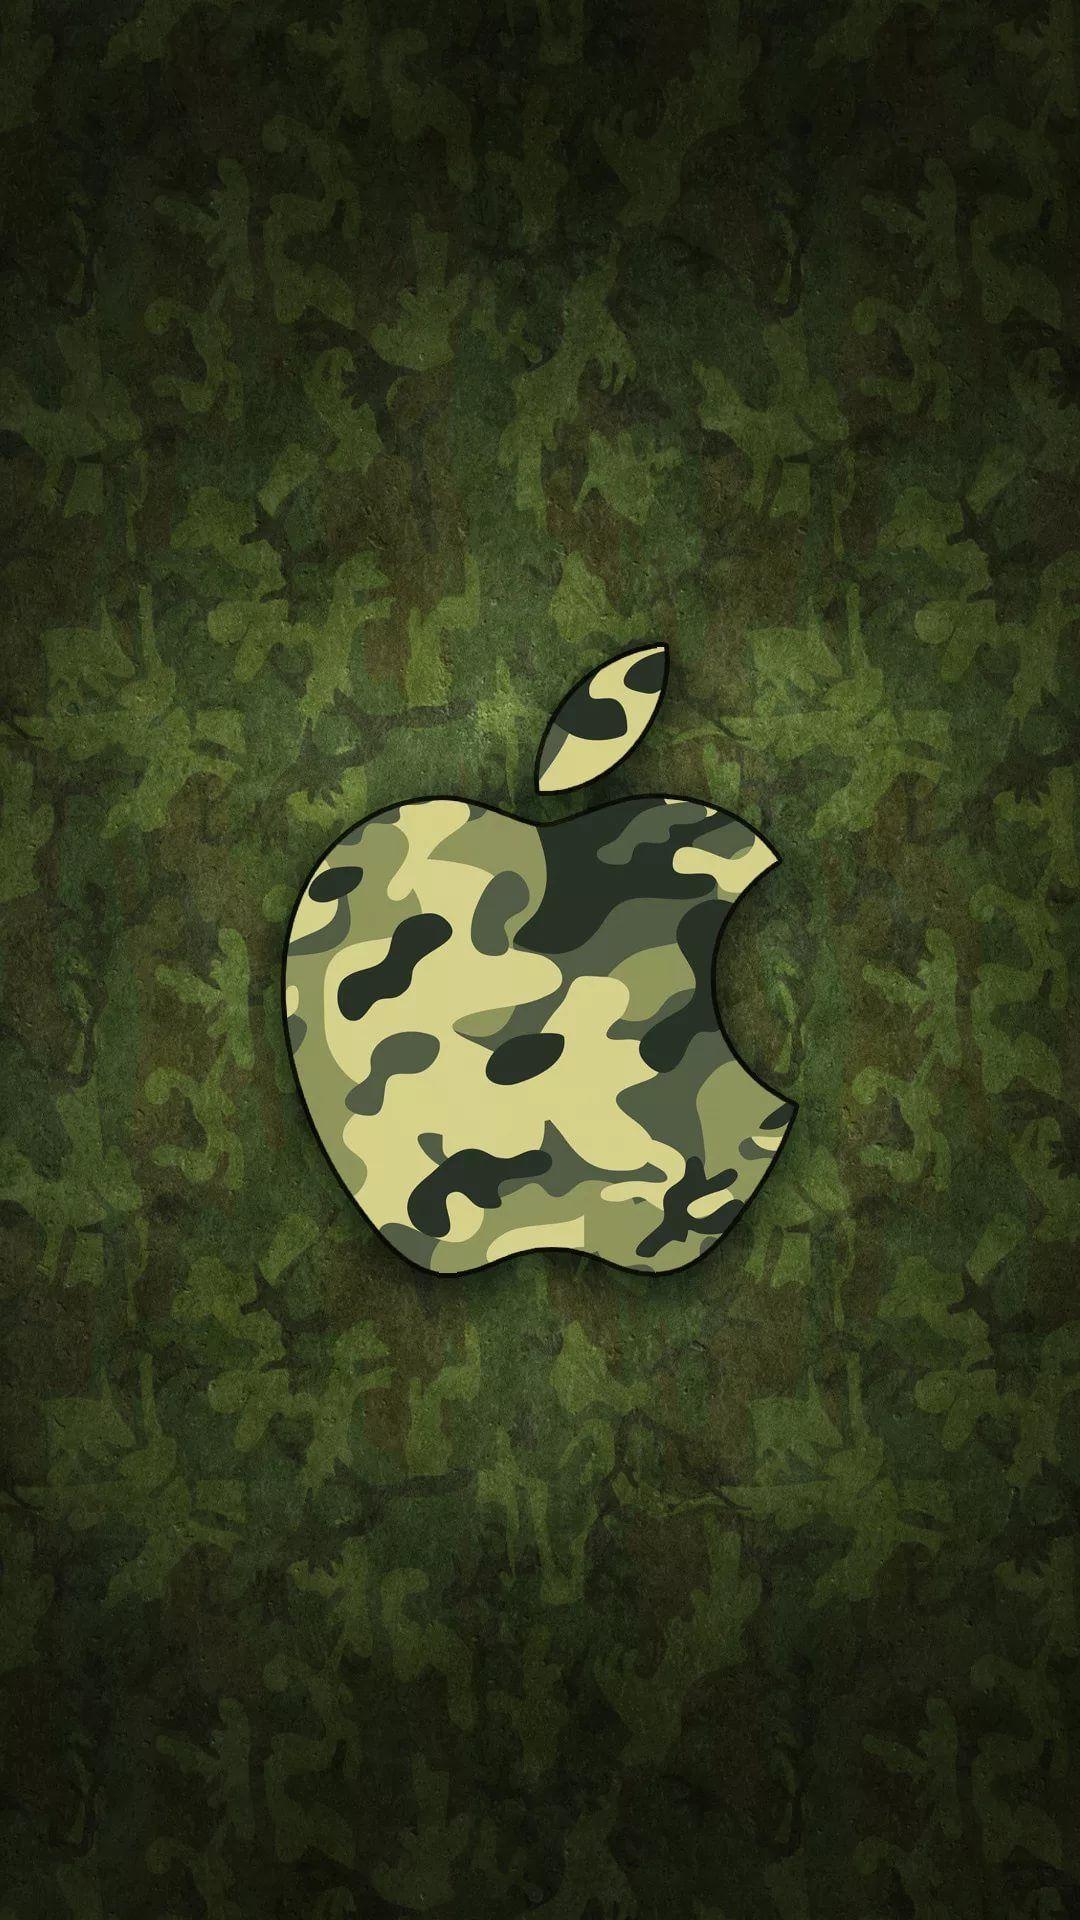 Realtree Ap hd wallpaper